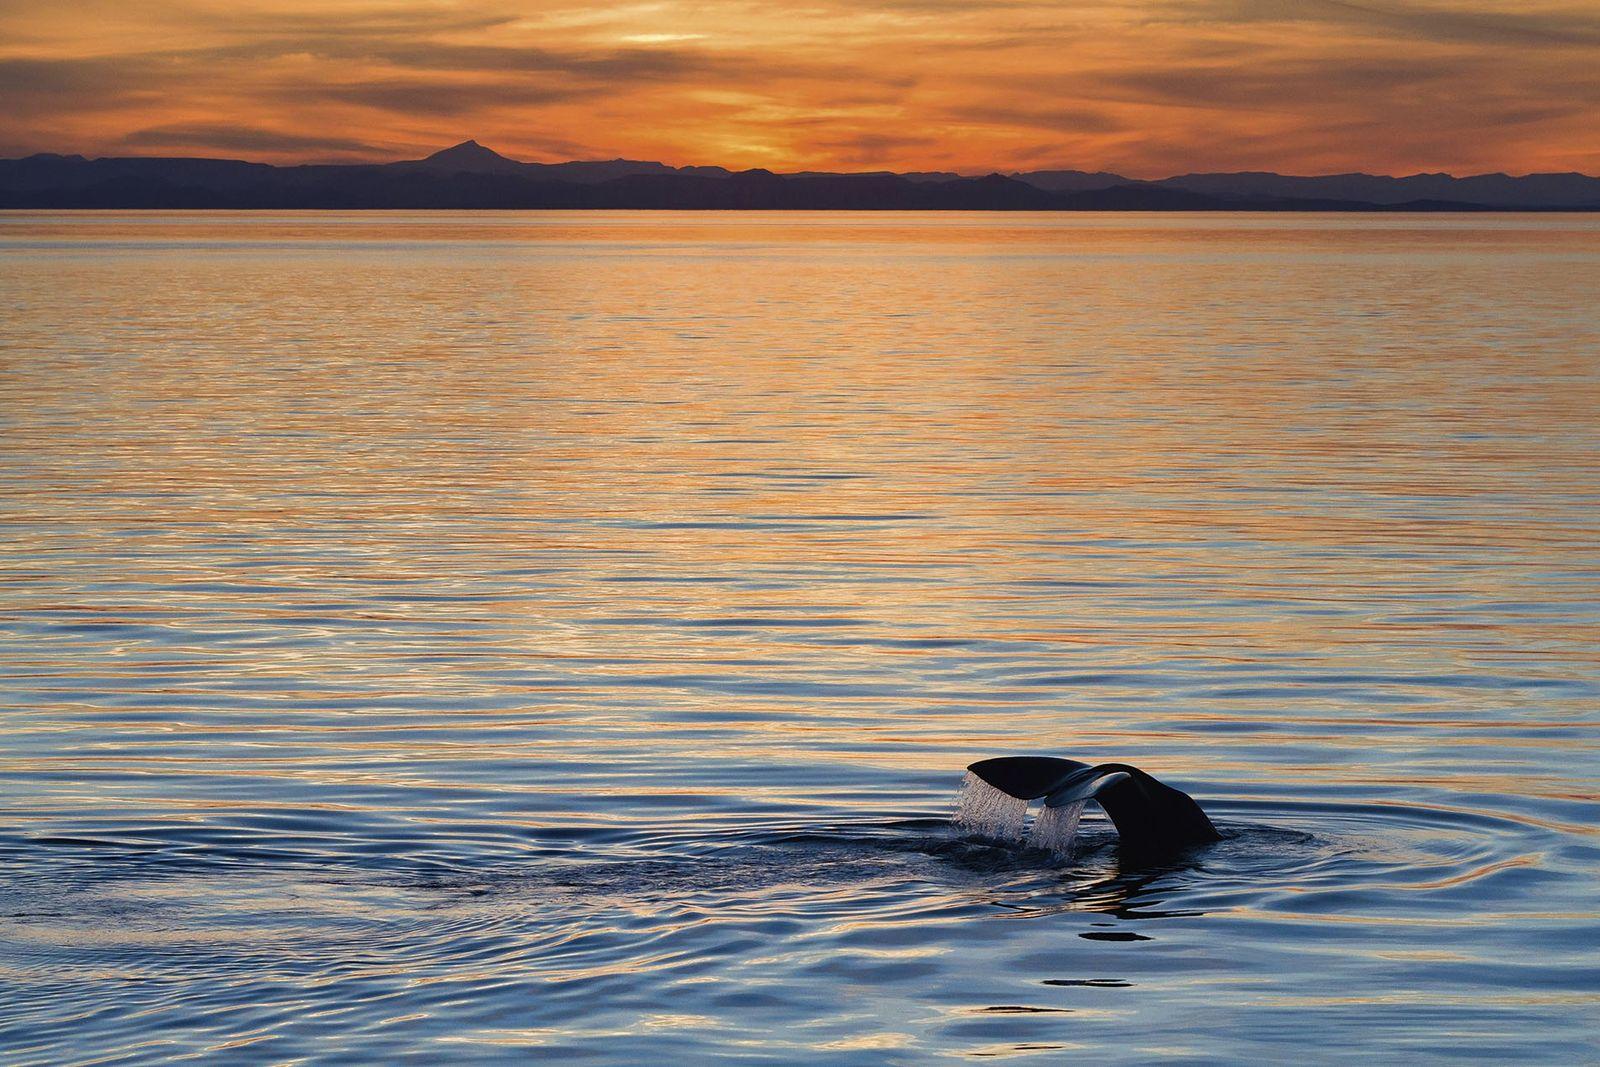 Sperm whale breaching at sunrise, Sea of Cortez.